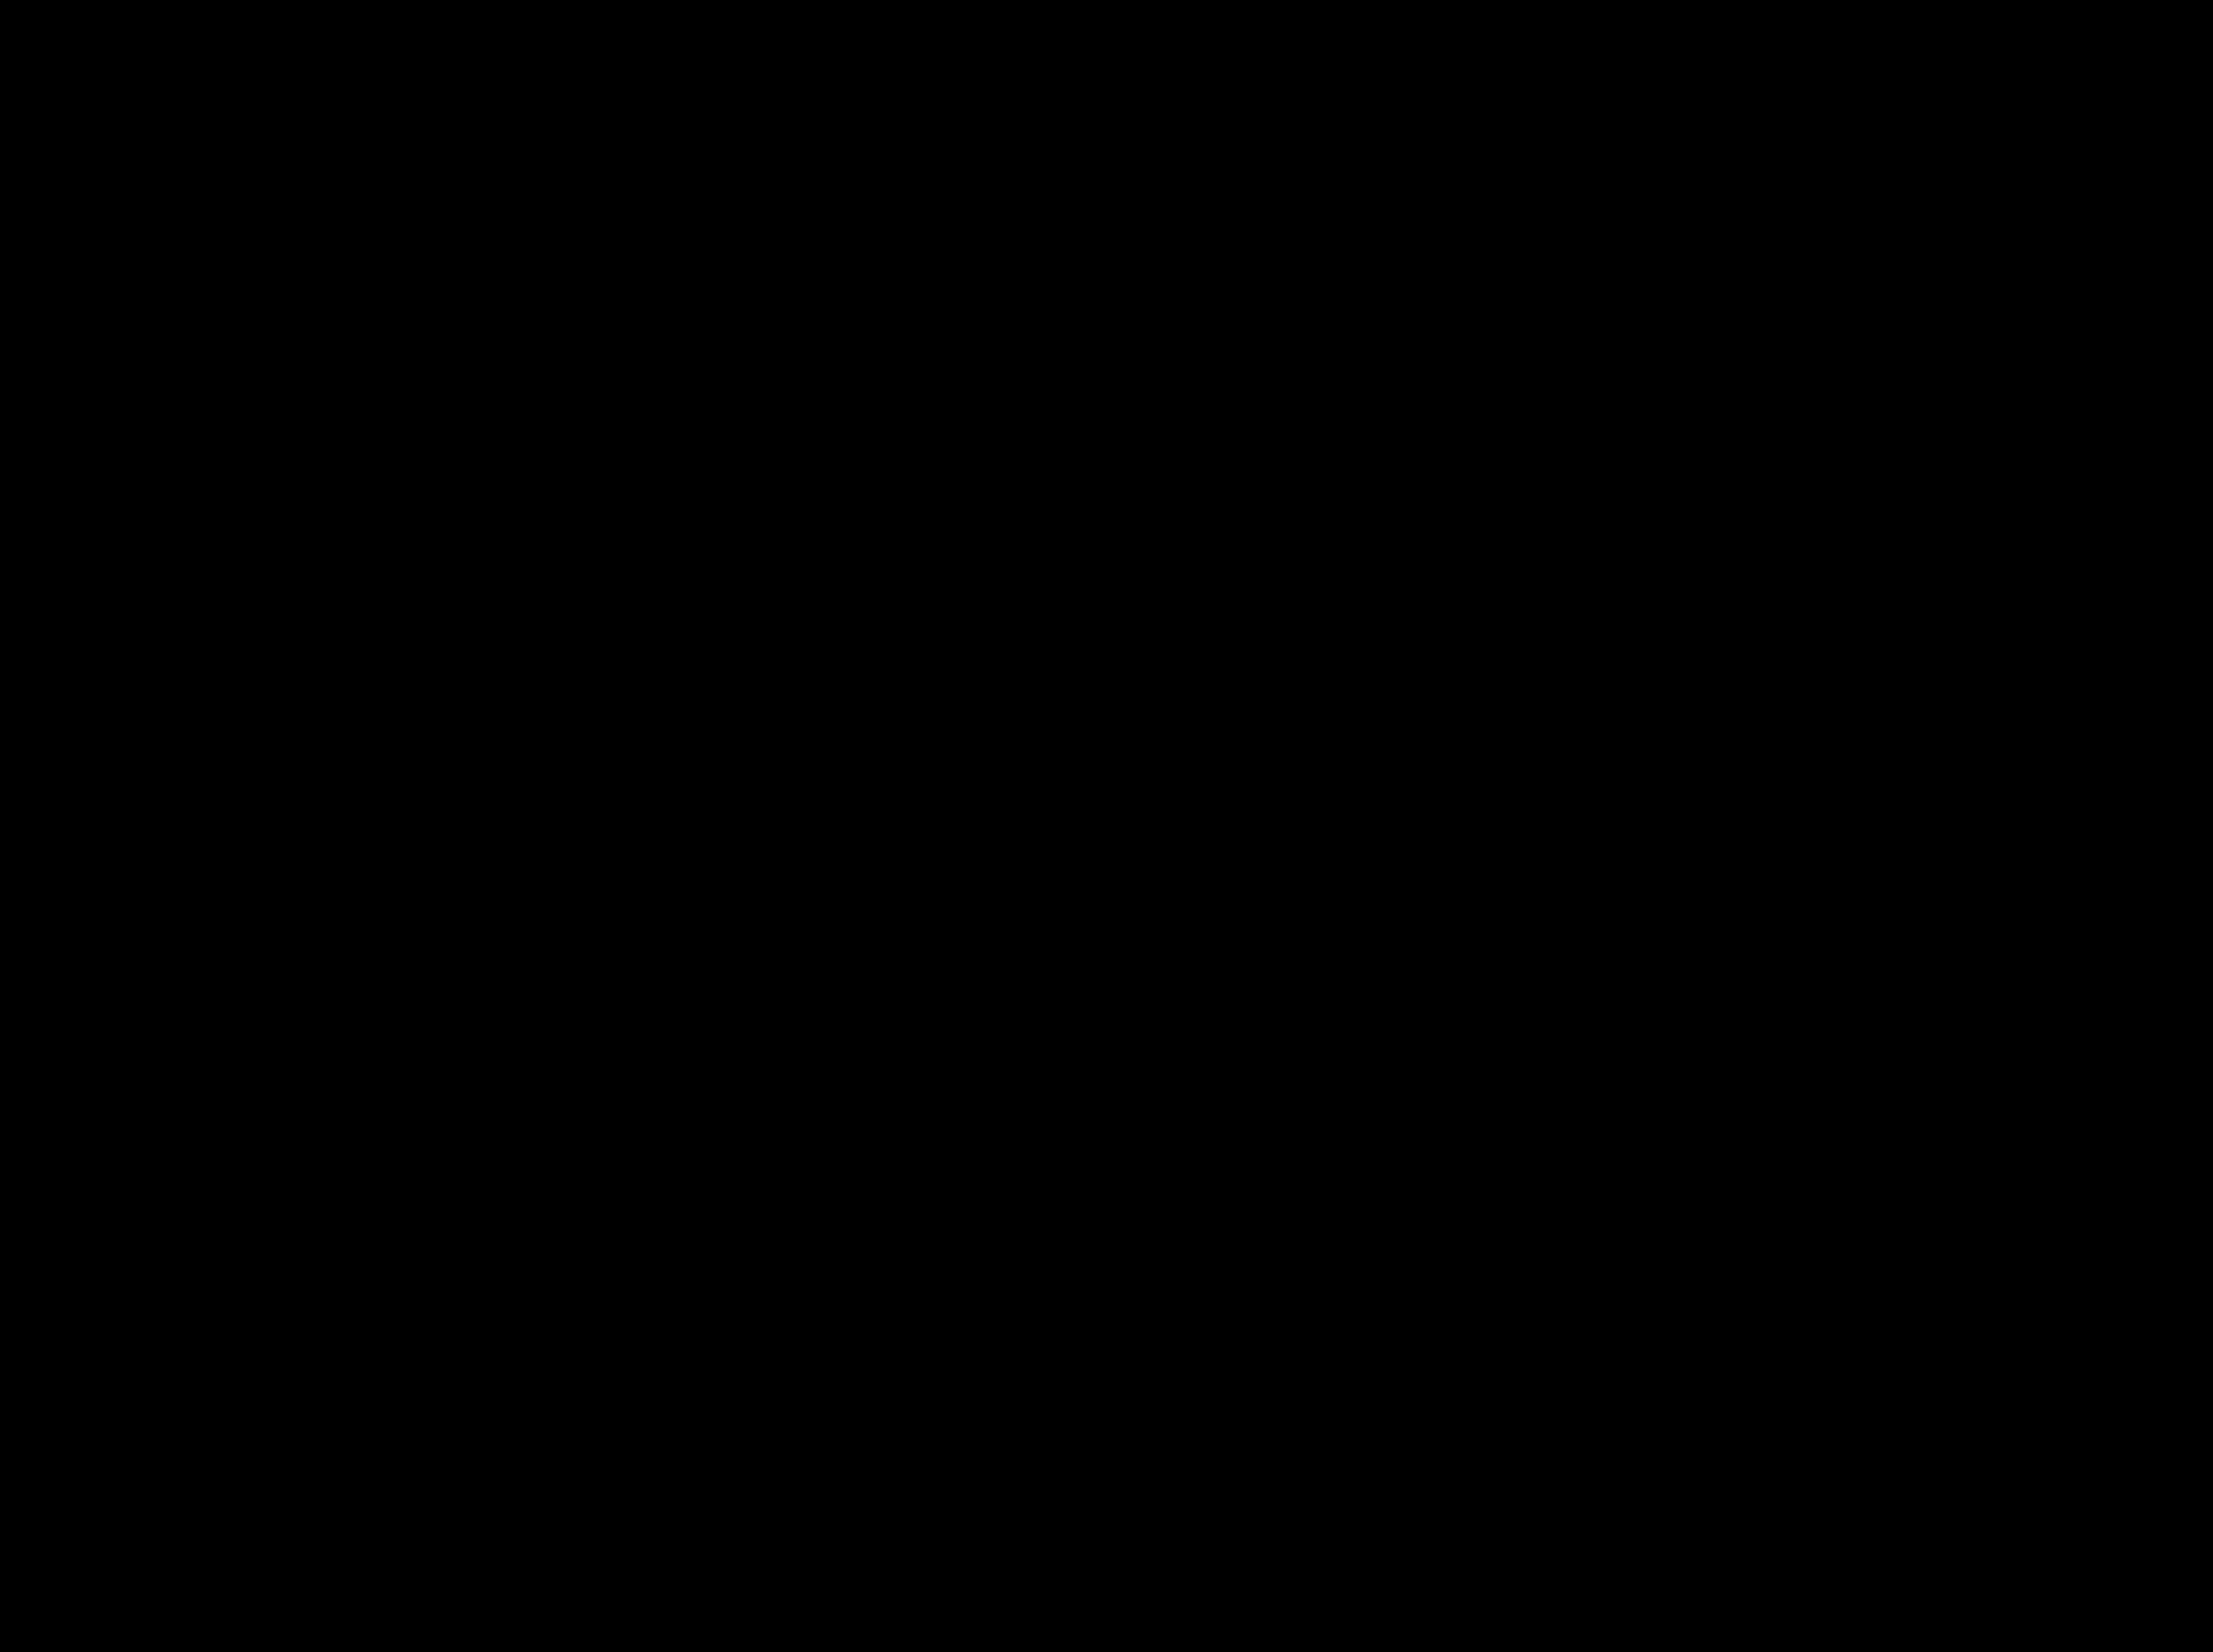 2400x1792 Clipart